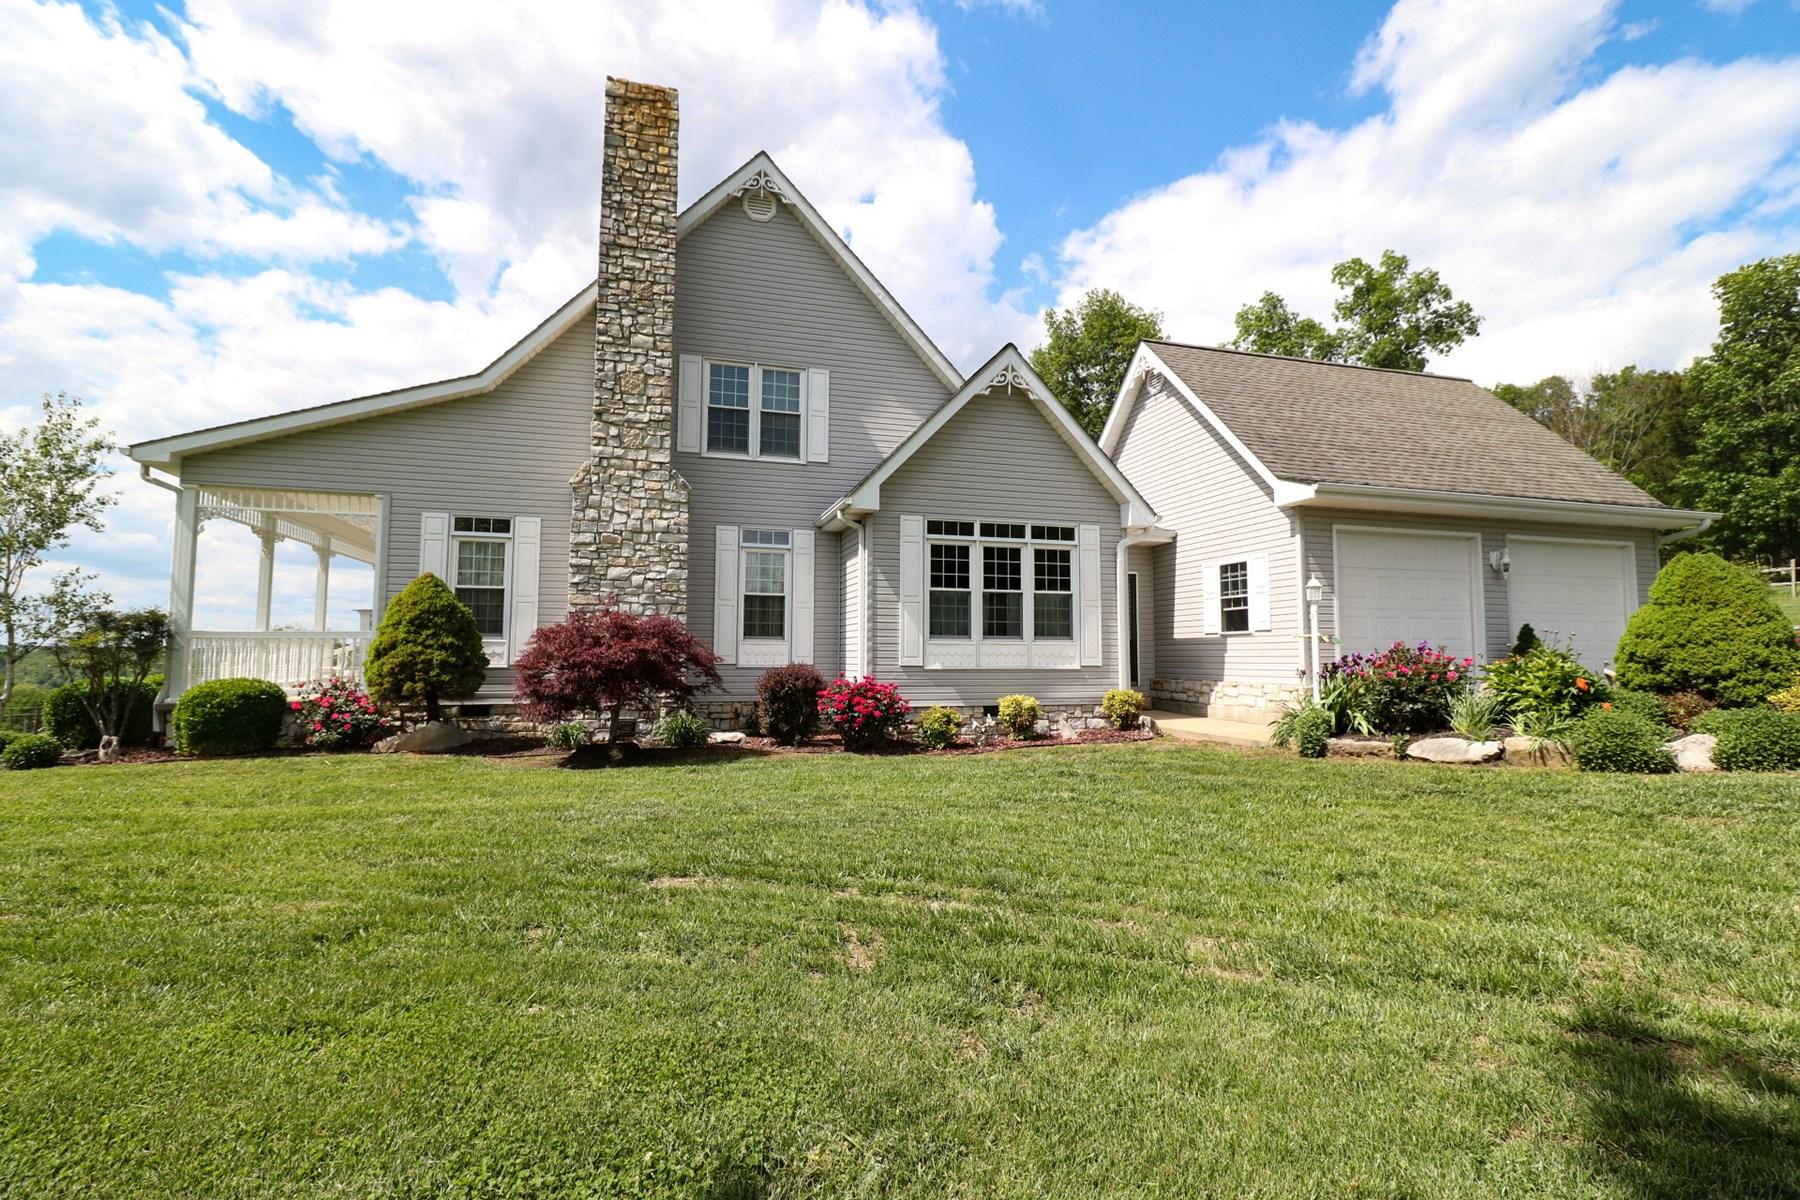 Country Home, Hobby farm, Equine property, 12 acres